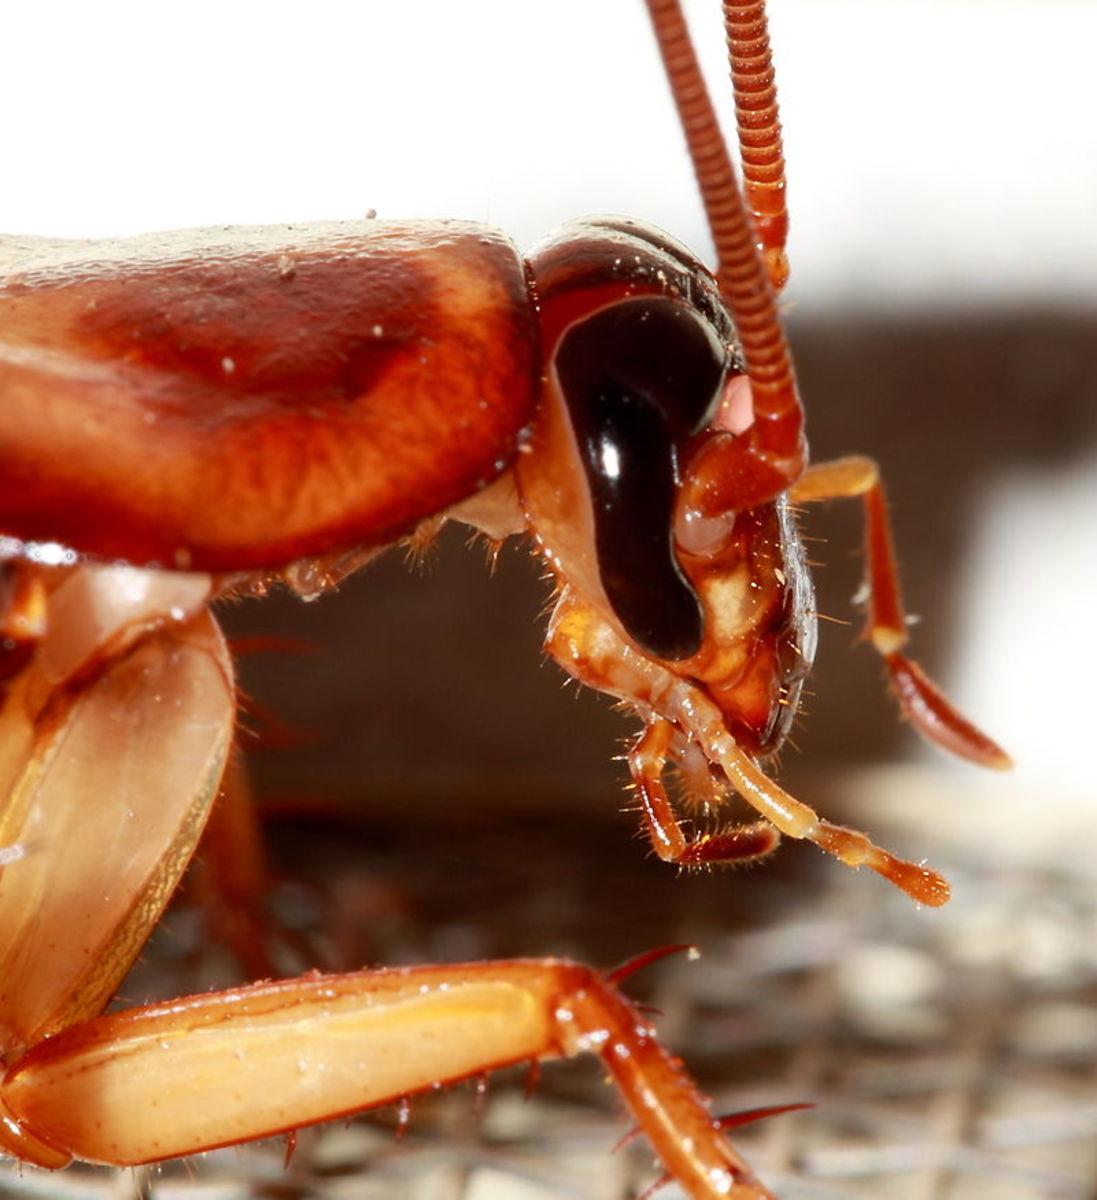 Head of American Cockroach.